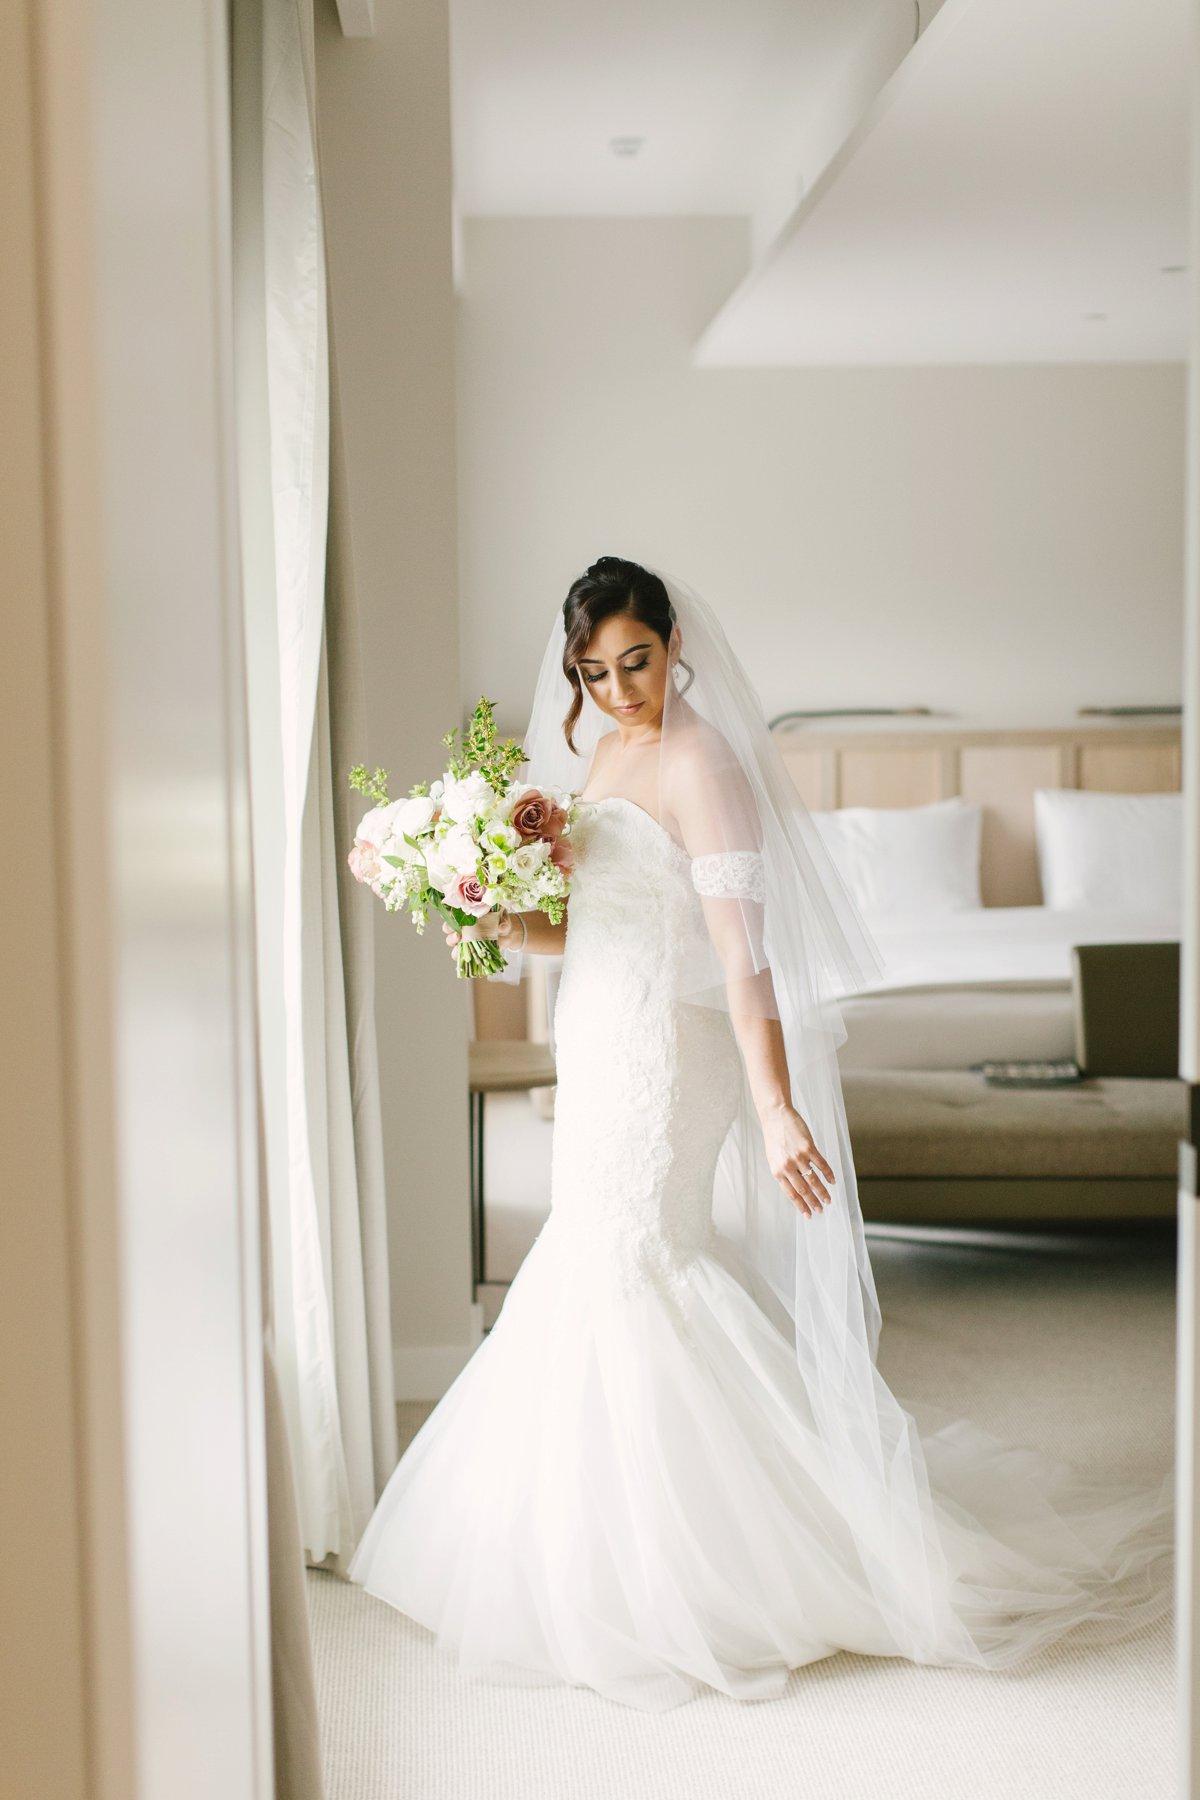 120320 classic romantic perth wedding by angela higgins